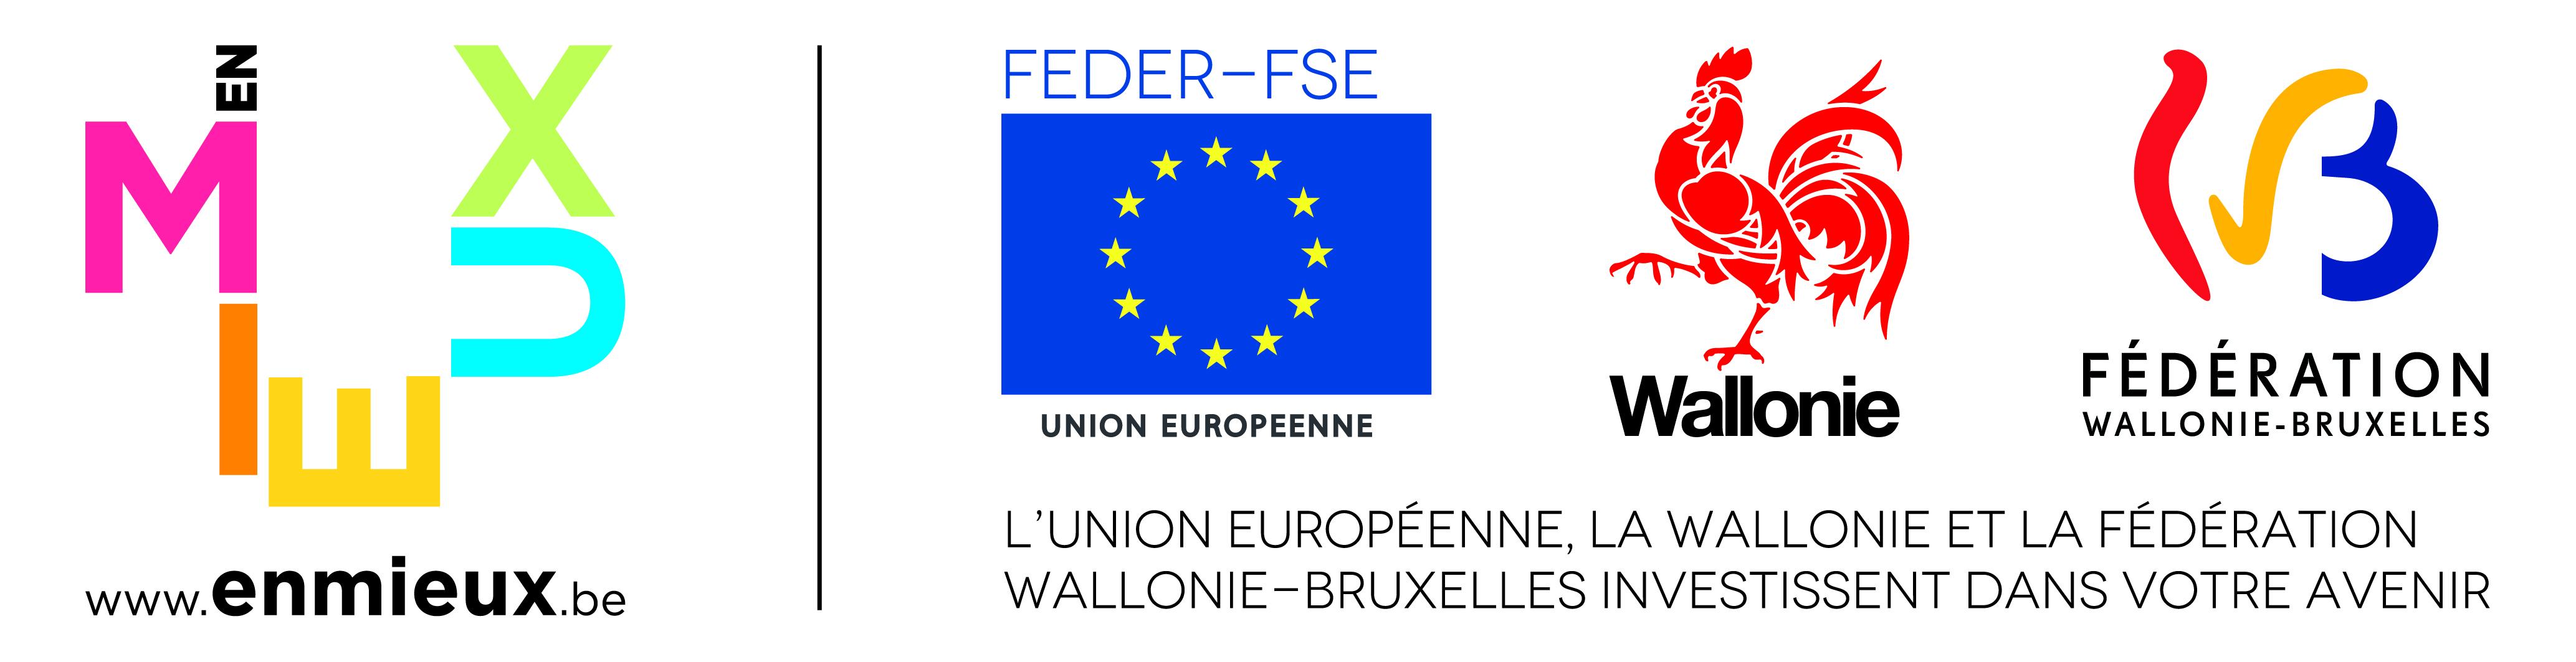 image logo_FEDER_FSEWALFWB.jpg (1.0MB)